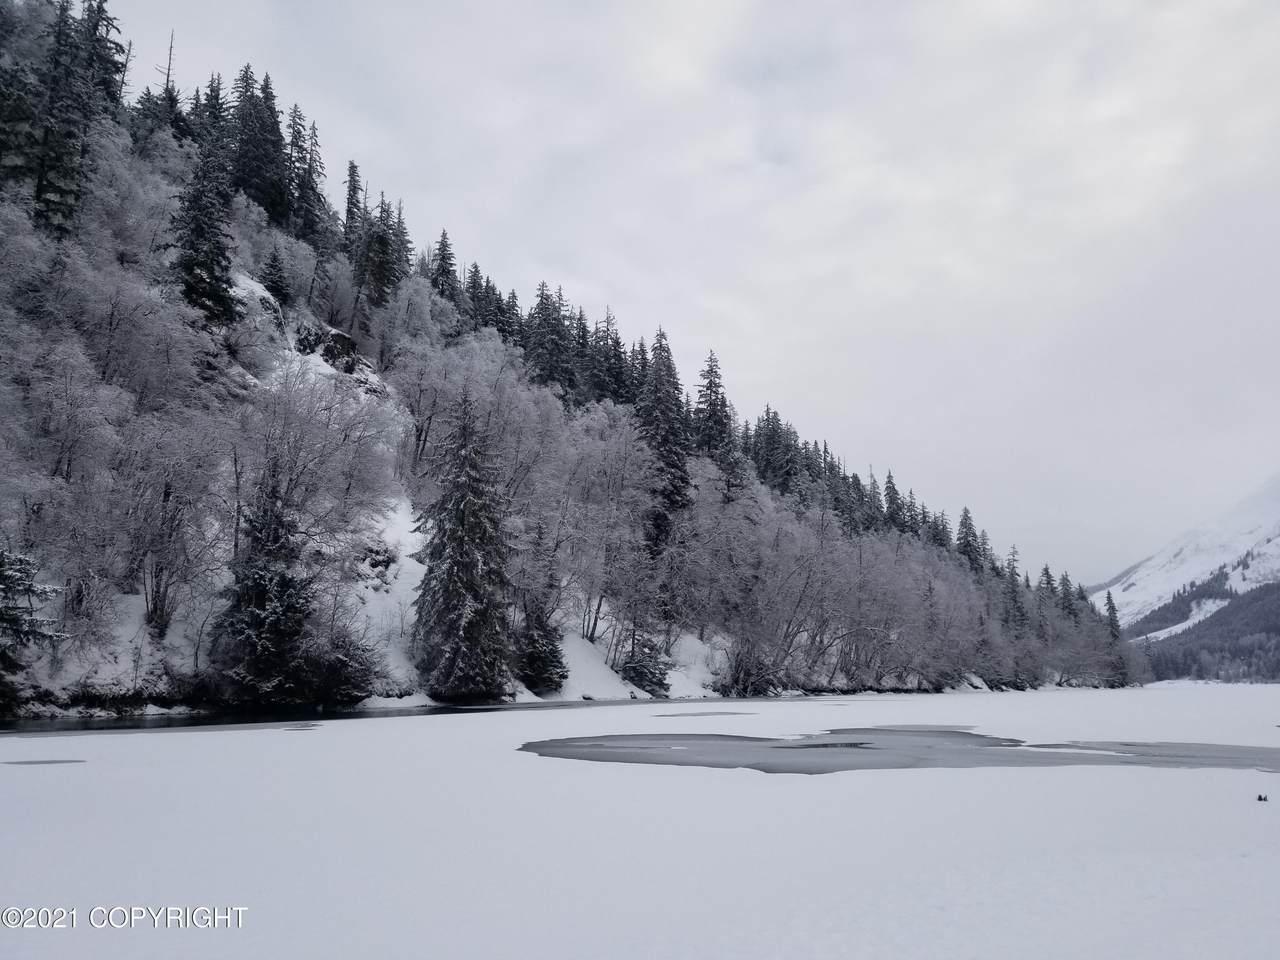 https://bt-photos.global.ssl.fastly.net/alaska/1280_boomver_1_21-4060-2.jpg